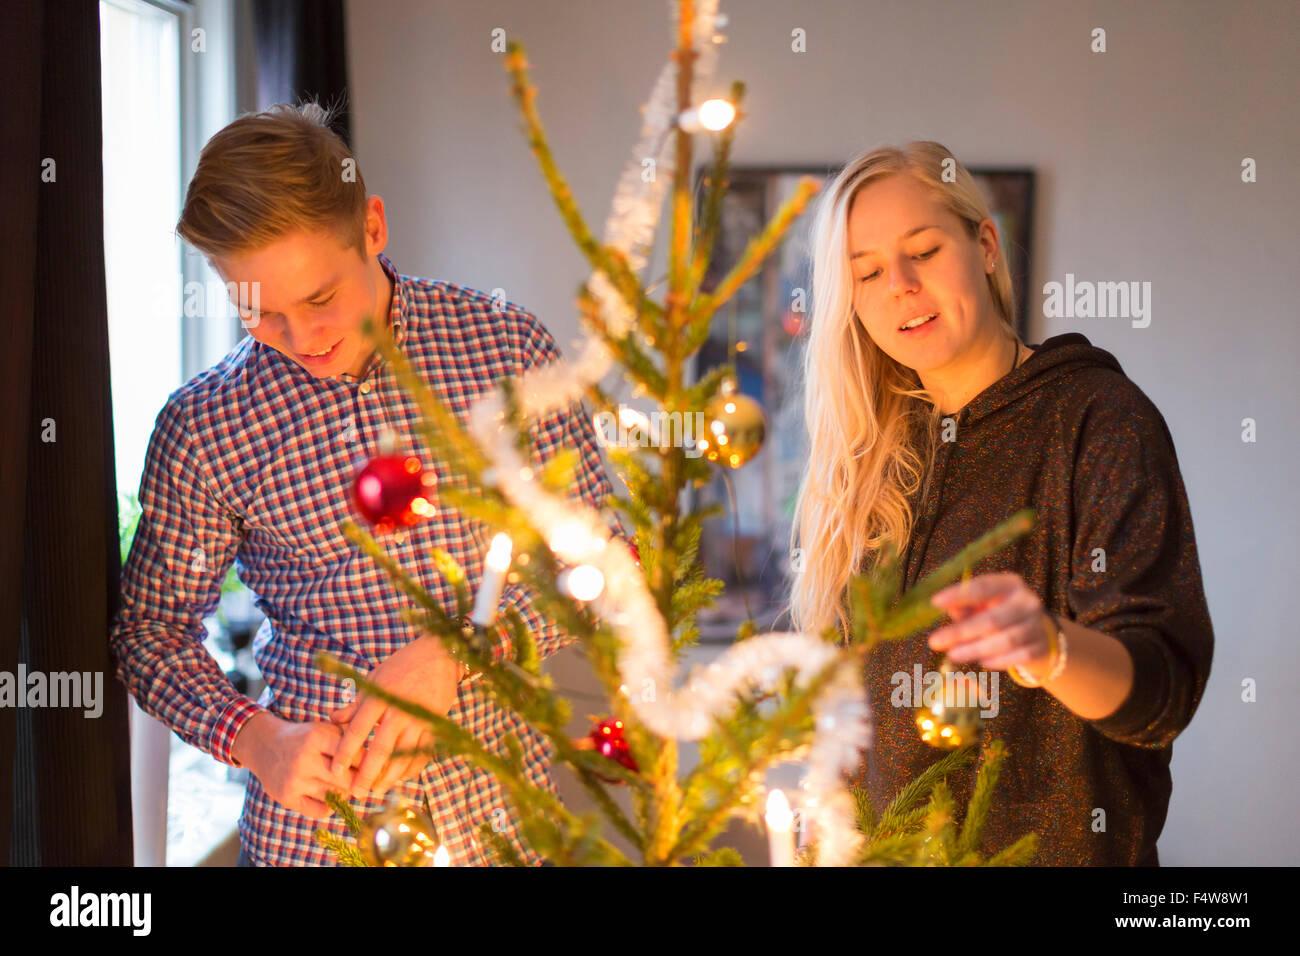 Couple decorating Christmas tree - Stock Image